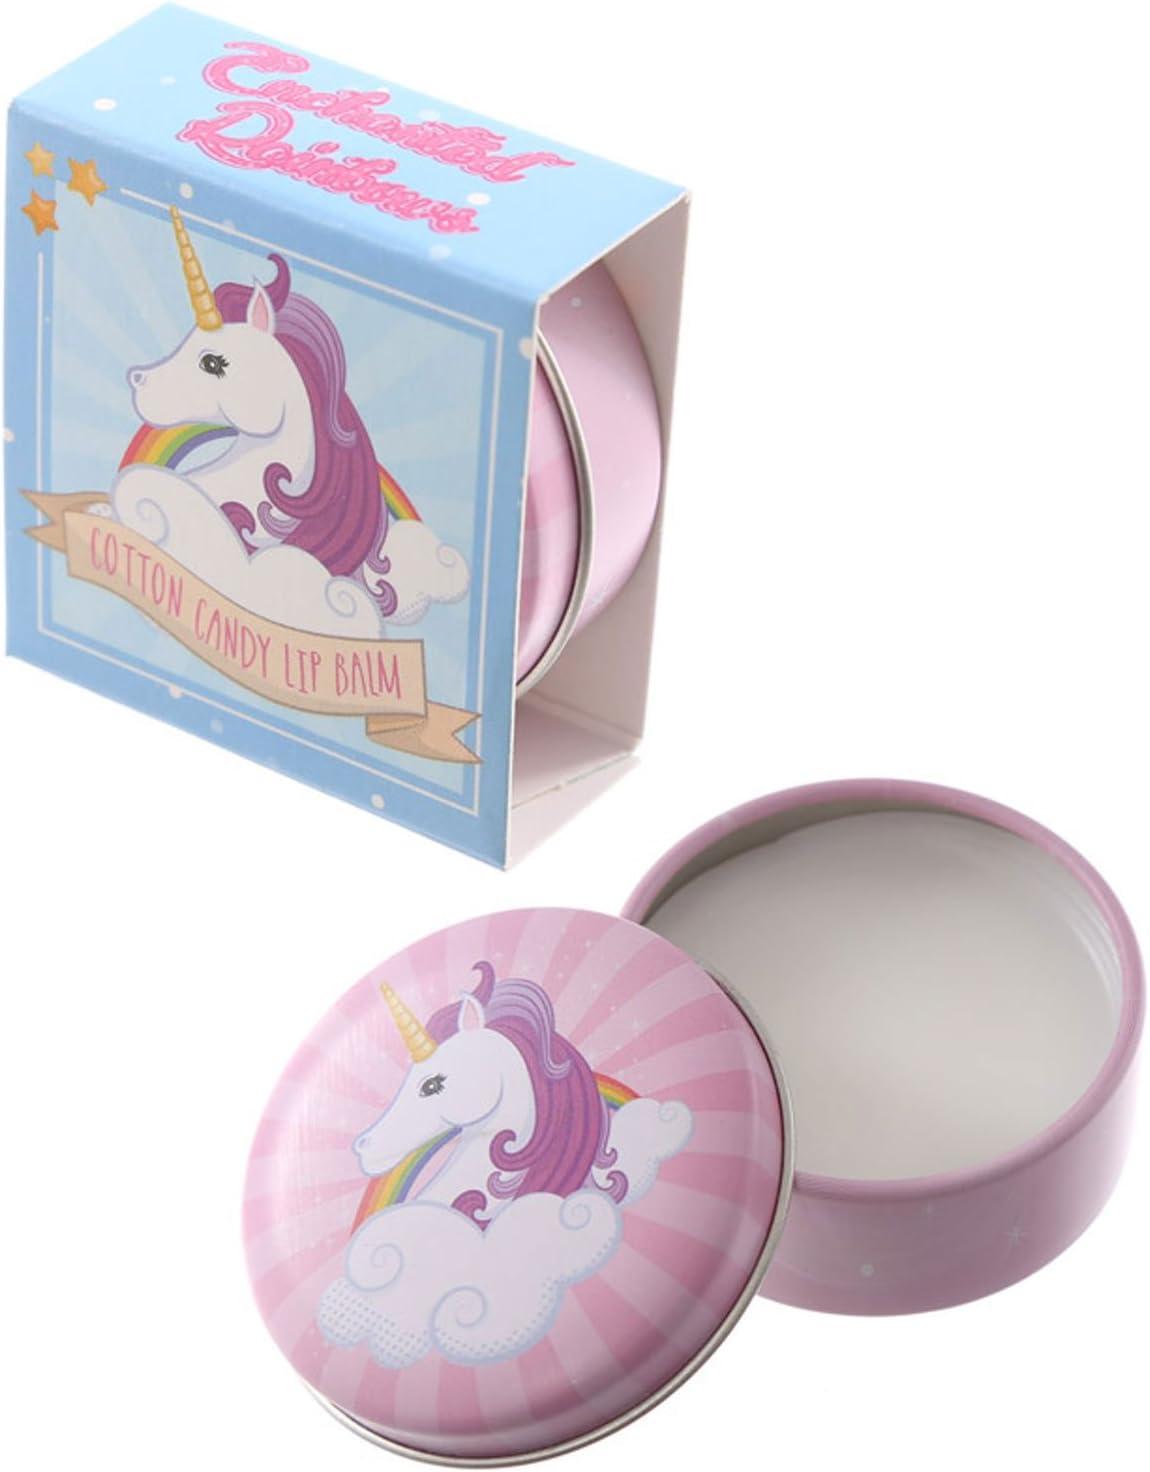 Lip Balm algodón Candy rosa unicornio lata: Amazon.es: Belleza